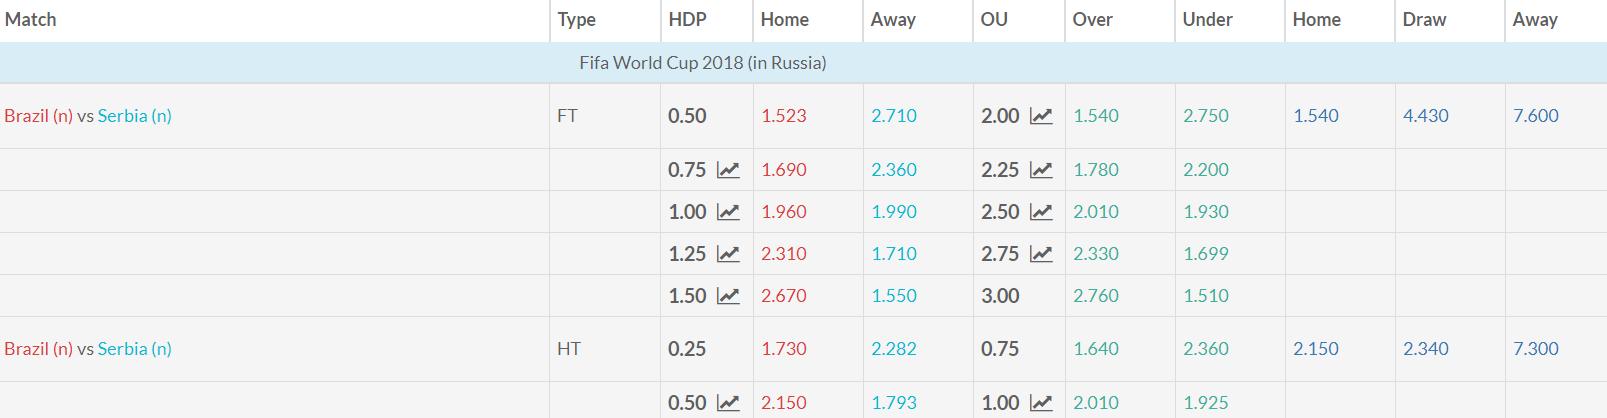 Brazil v Serbia Match Betting Odds